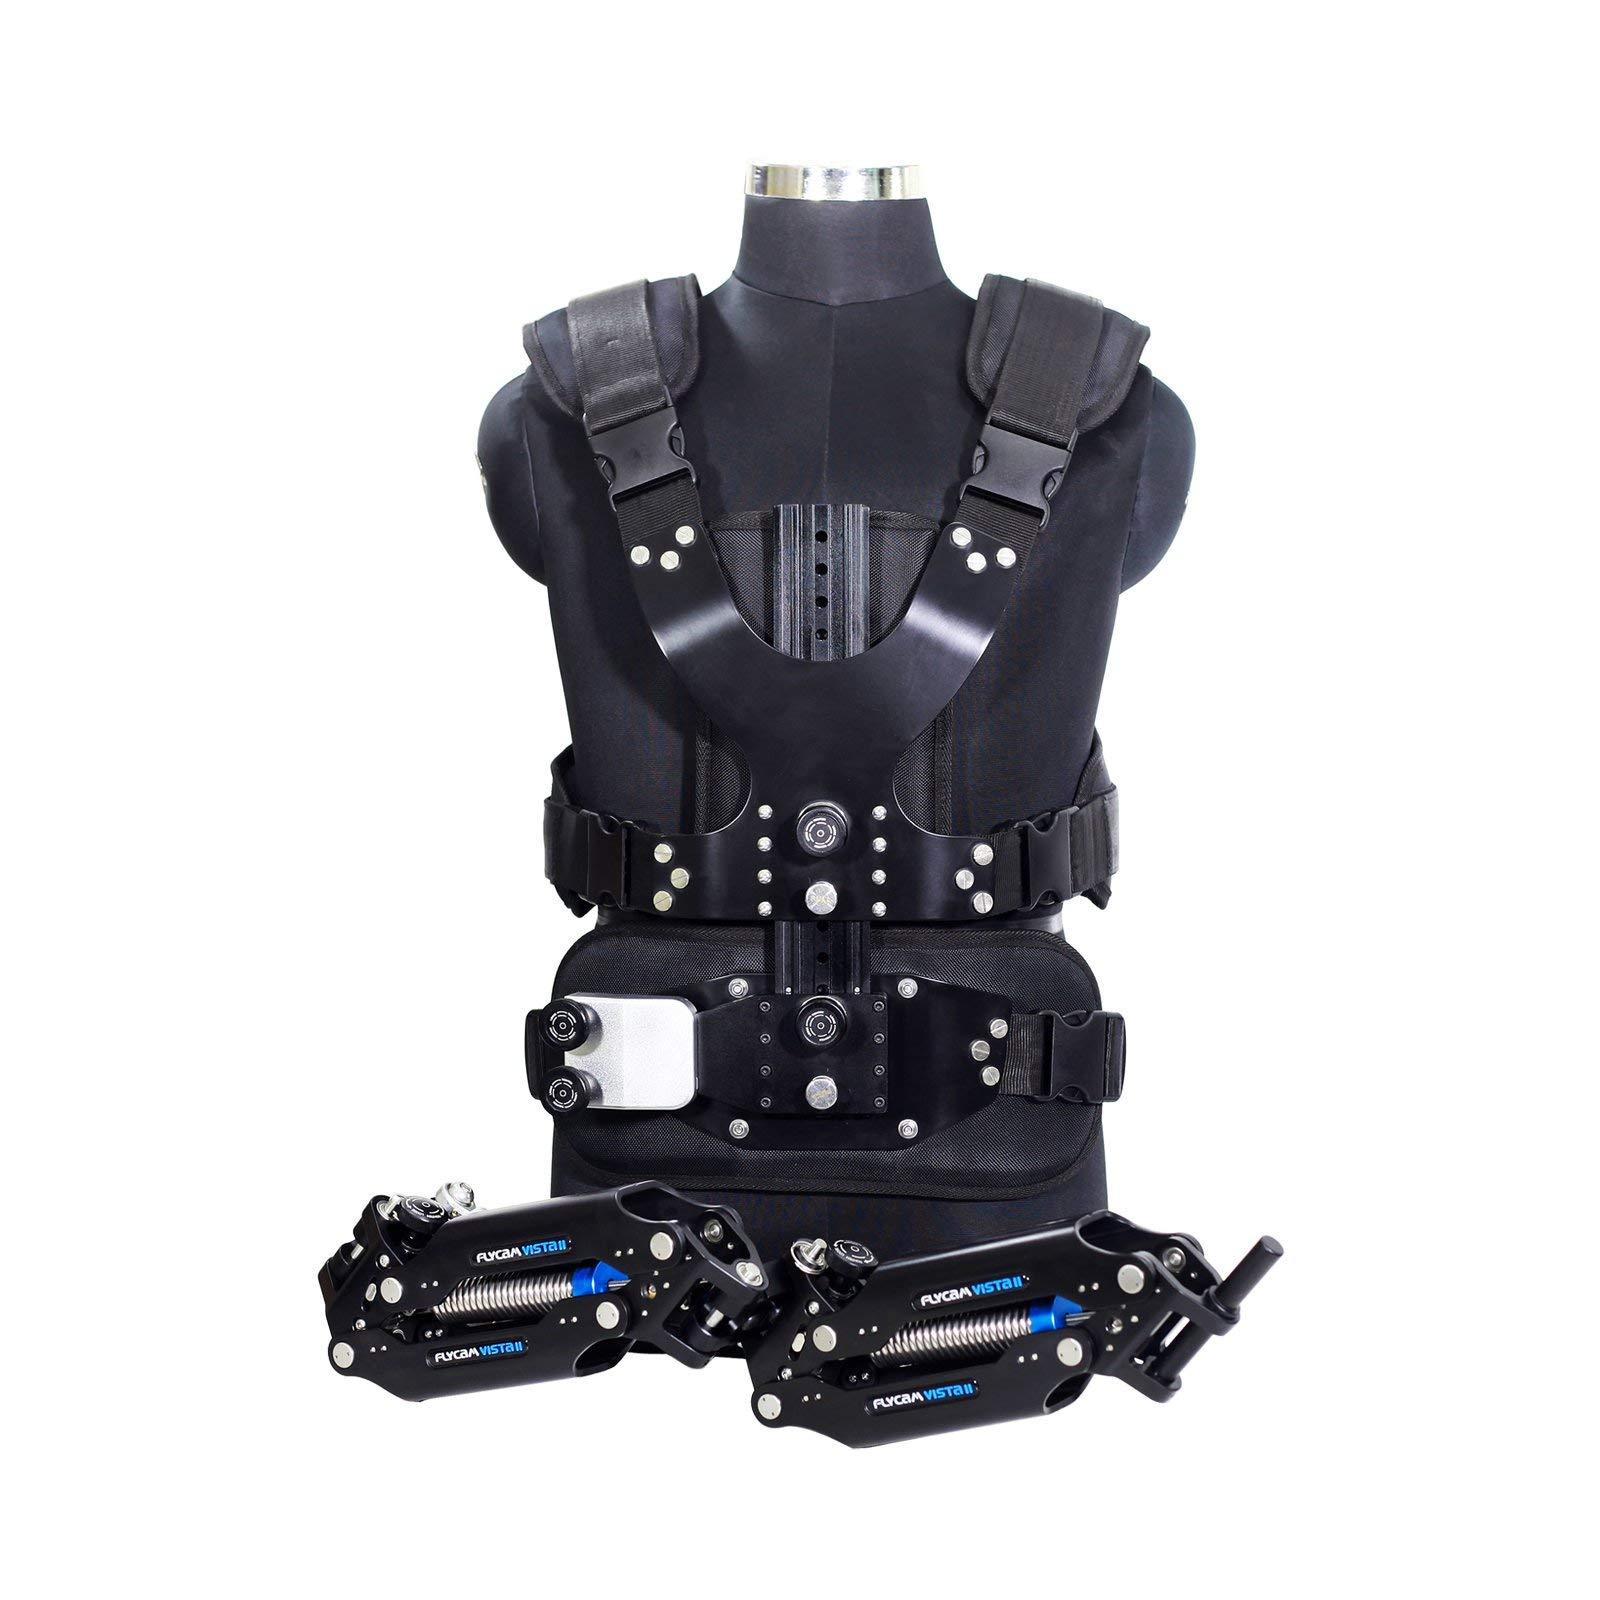 FLYCAM Vista-II Stabilizing Arm & Vest for Handheld Camera Video Steadycam Stabilizer Upto 15kg/33lbs   Professional Stabilization Body Mount System for DSLR Camera Stabilization (VSTA-II-AV) by FLYCAM